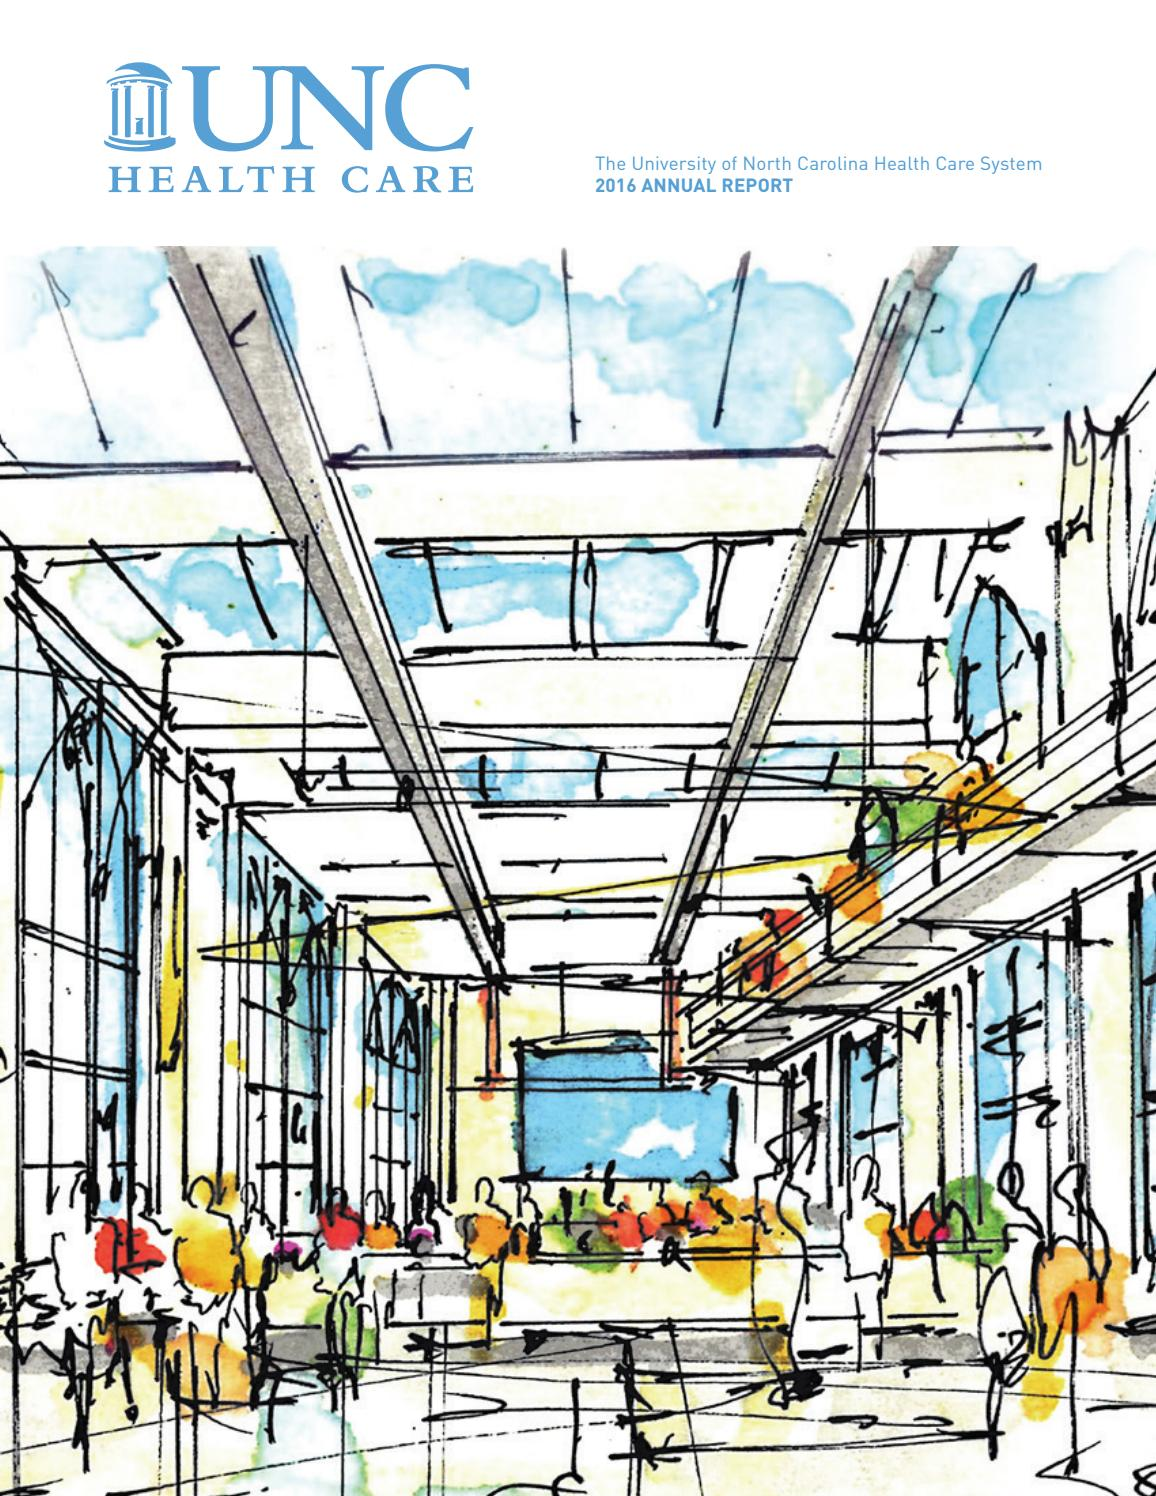 h&m annual report 2016 pdf